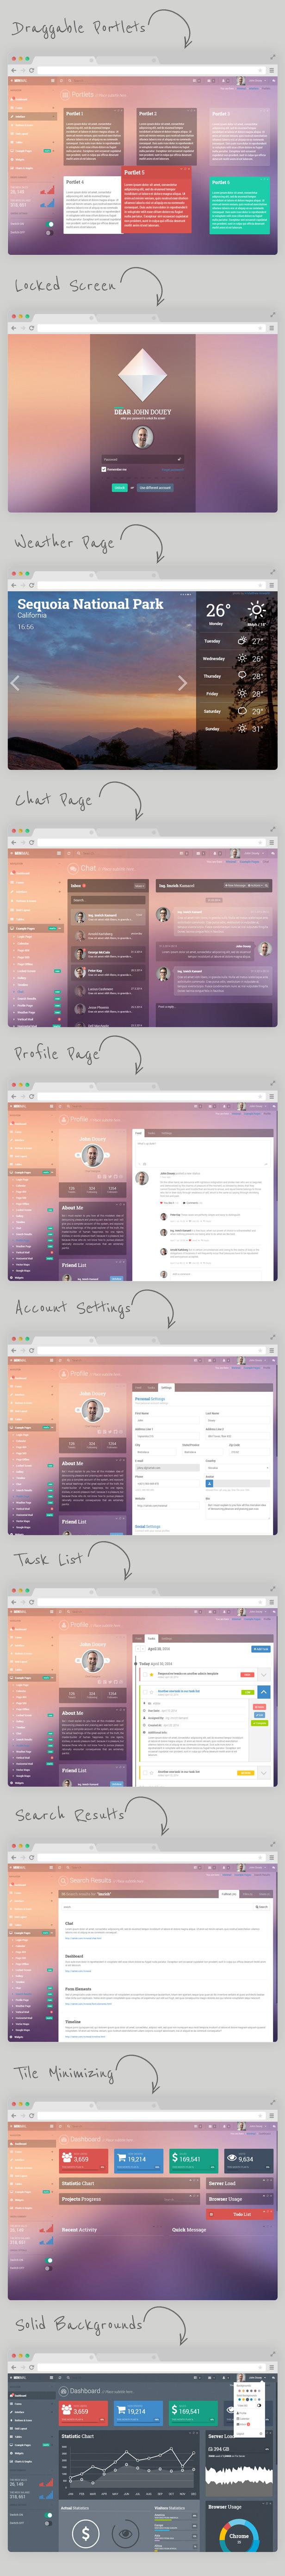 highlights new version - Minimal - Responsive Admin Template